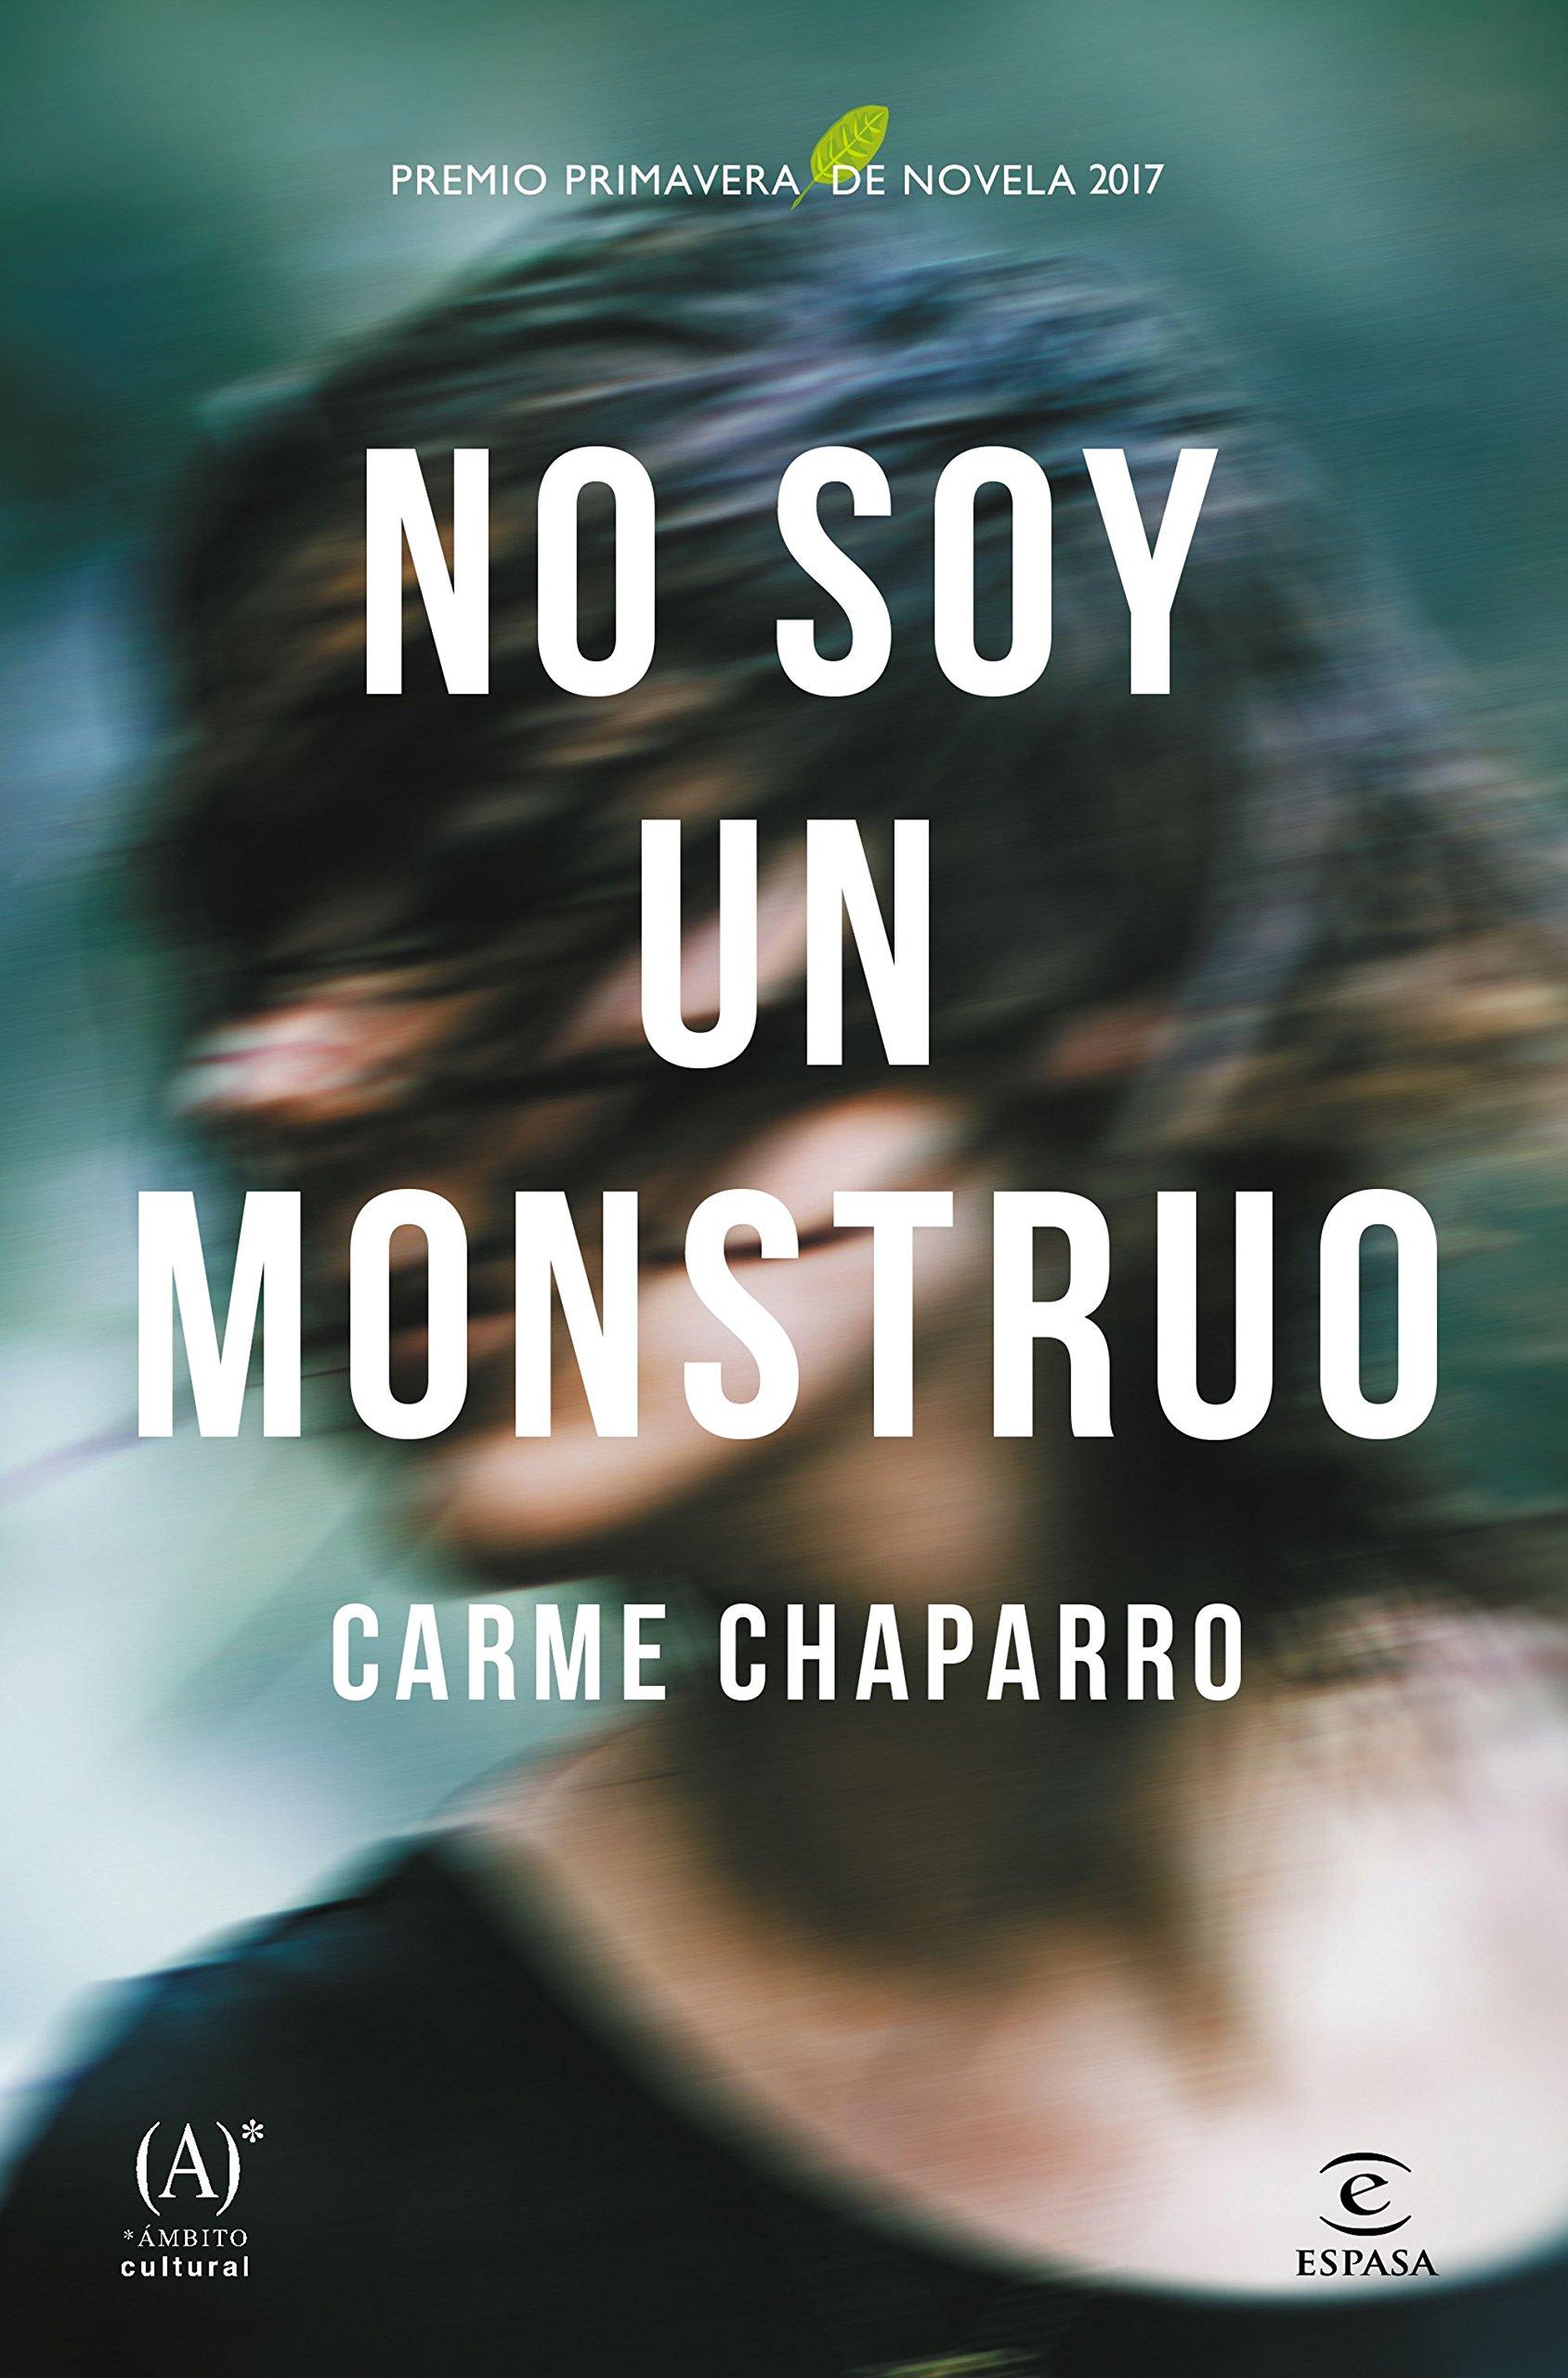 No soy un monstruo: Premio primavera de novela 2017 ESPASA ...